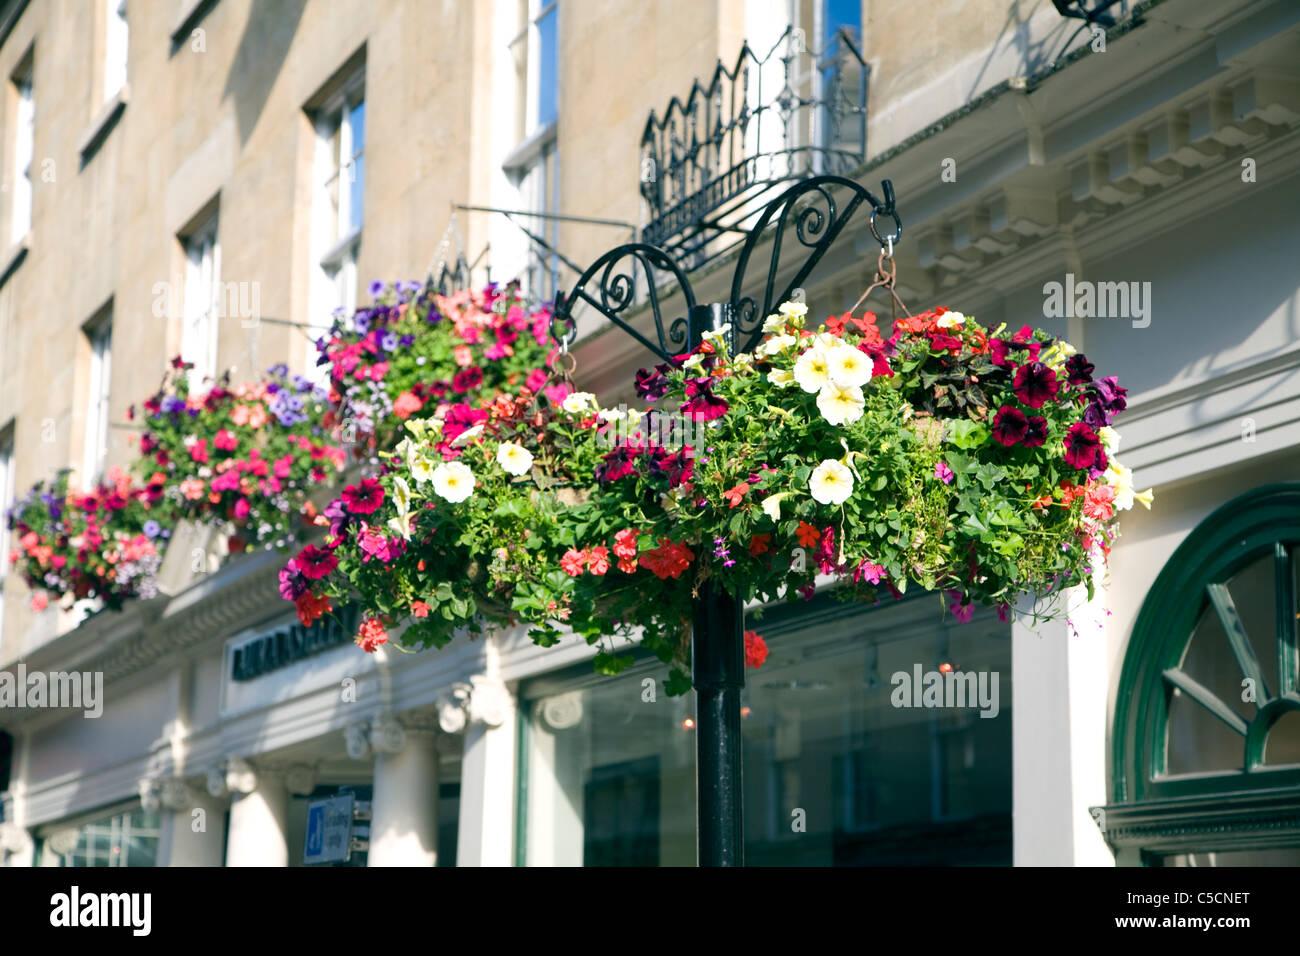 Hanging baskets of flowers, Bath, England - Stock Image